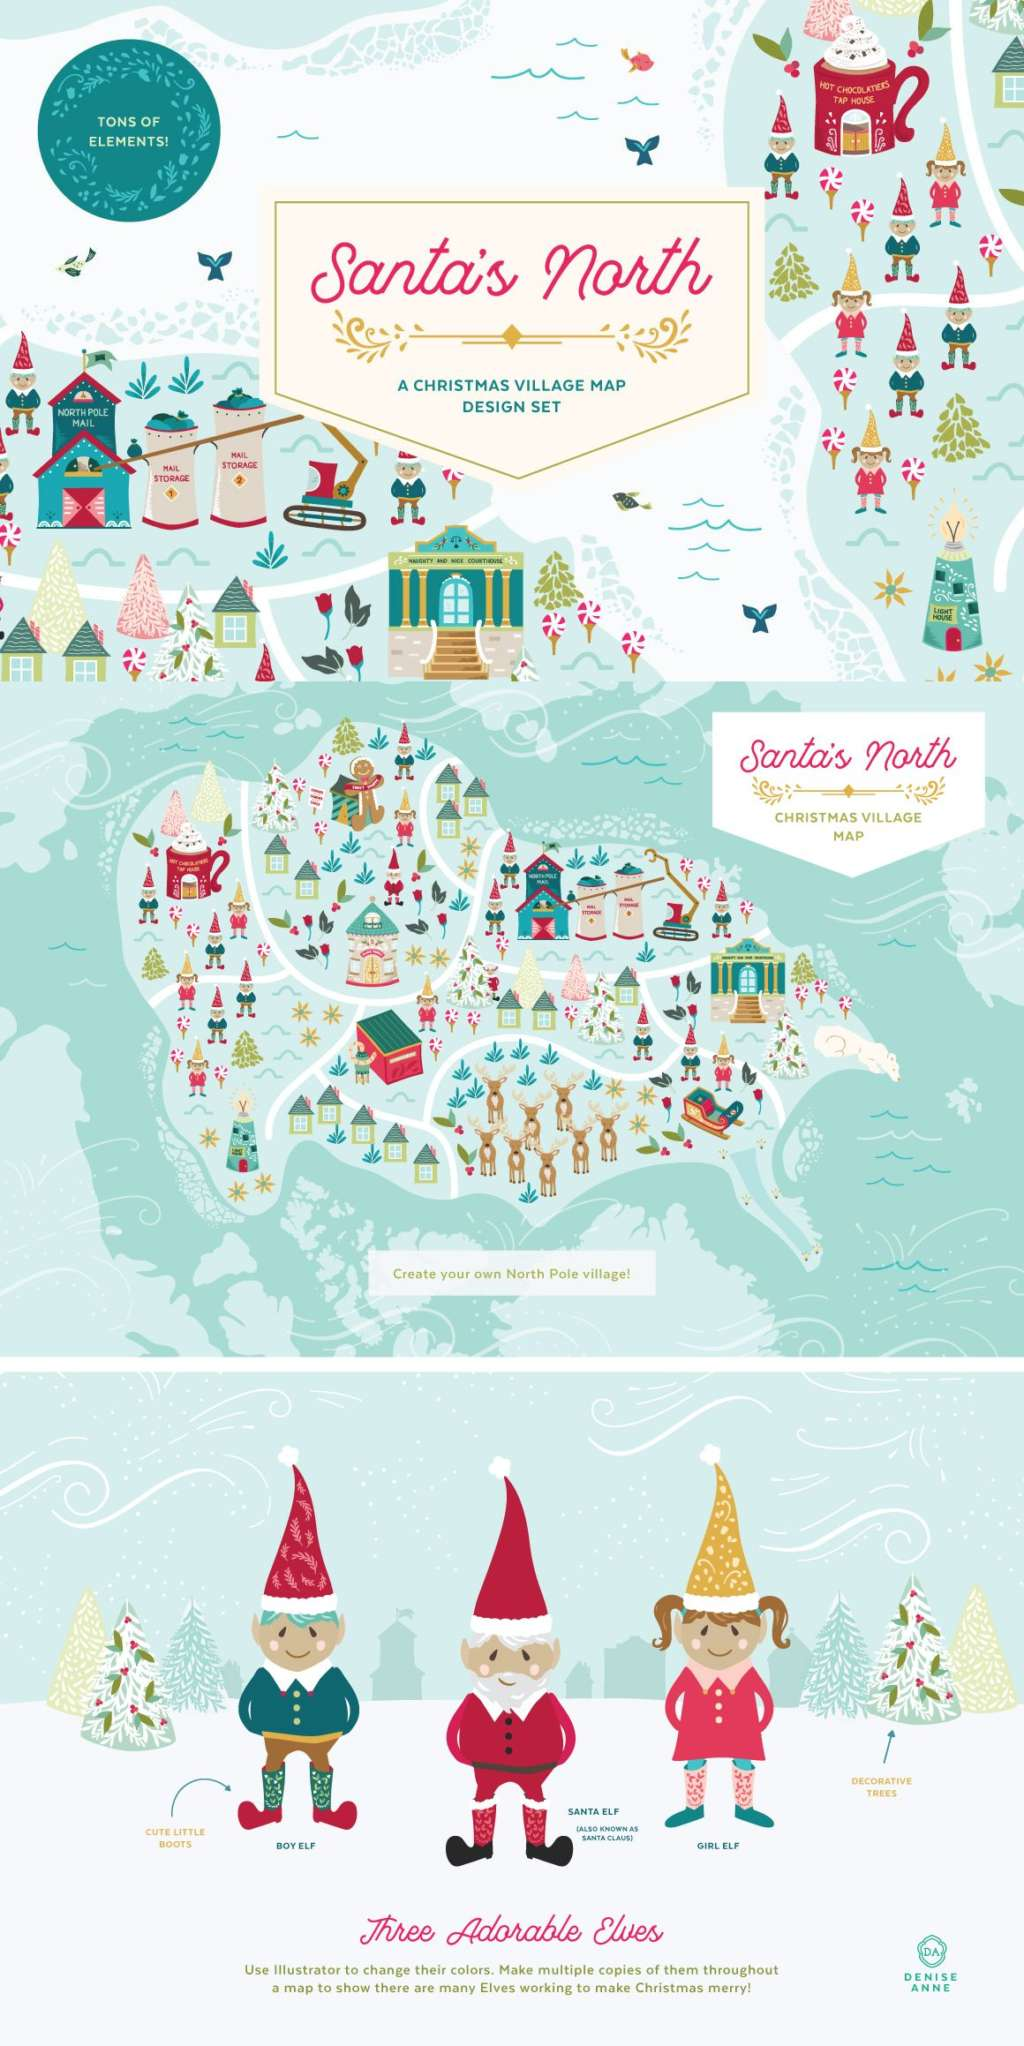 Santa's North Christmas Village Map Design Set